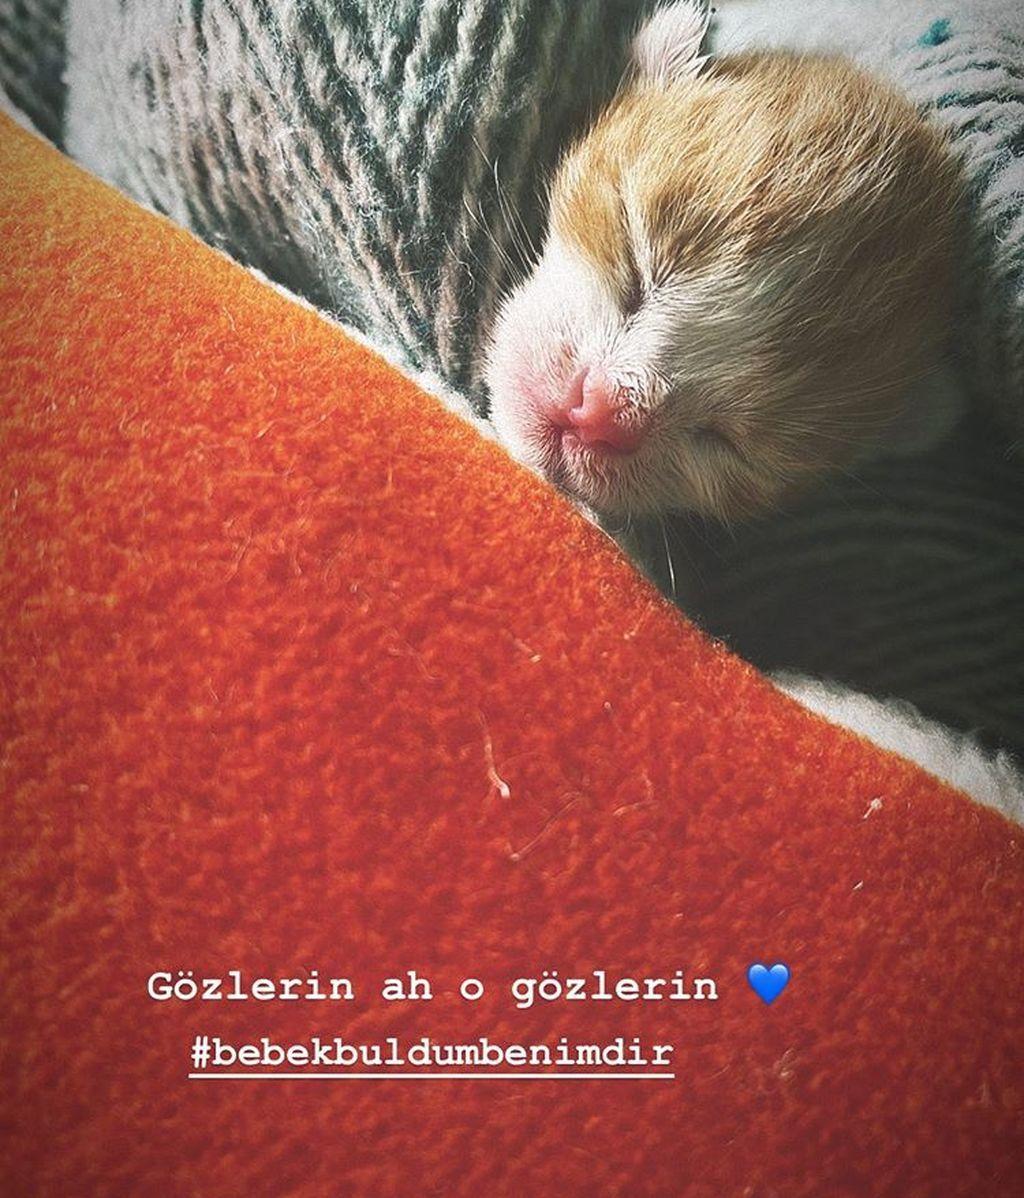 El gato de Demet Özdemir